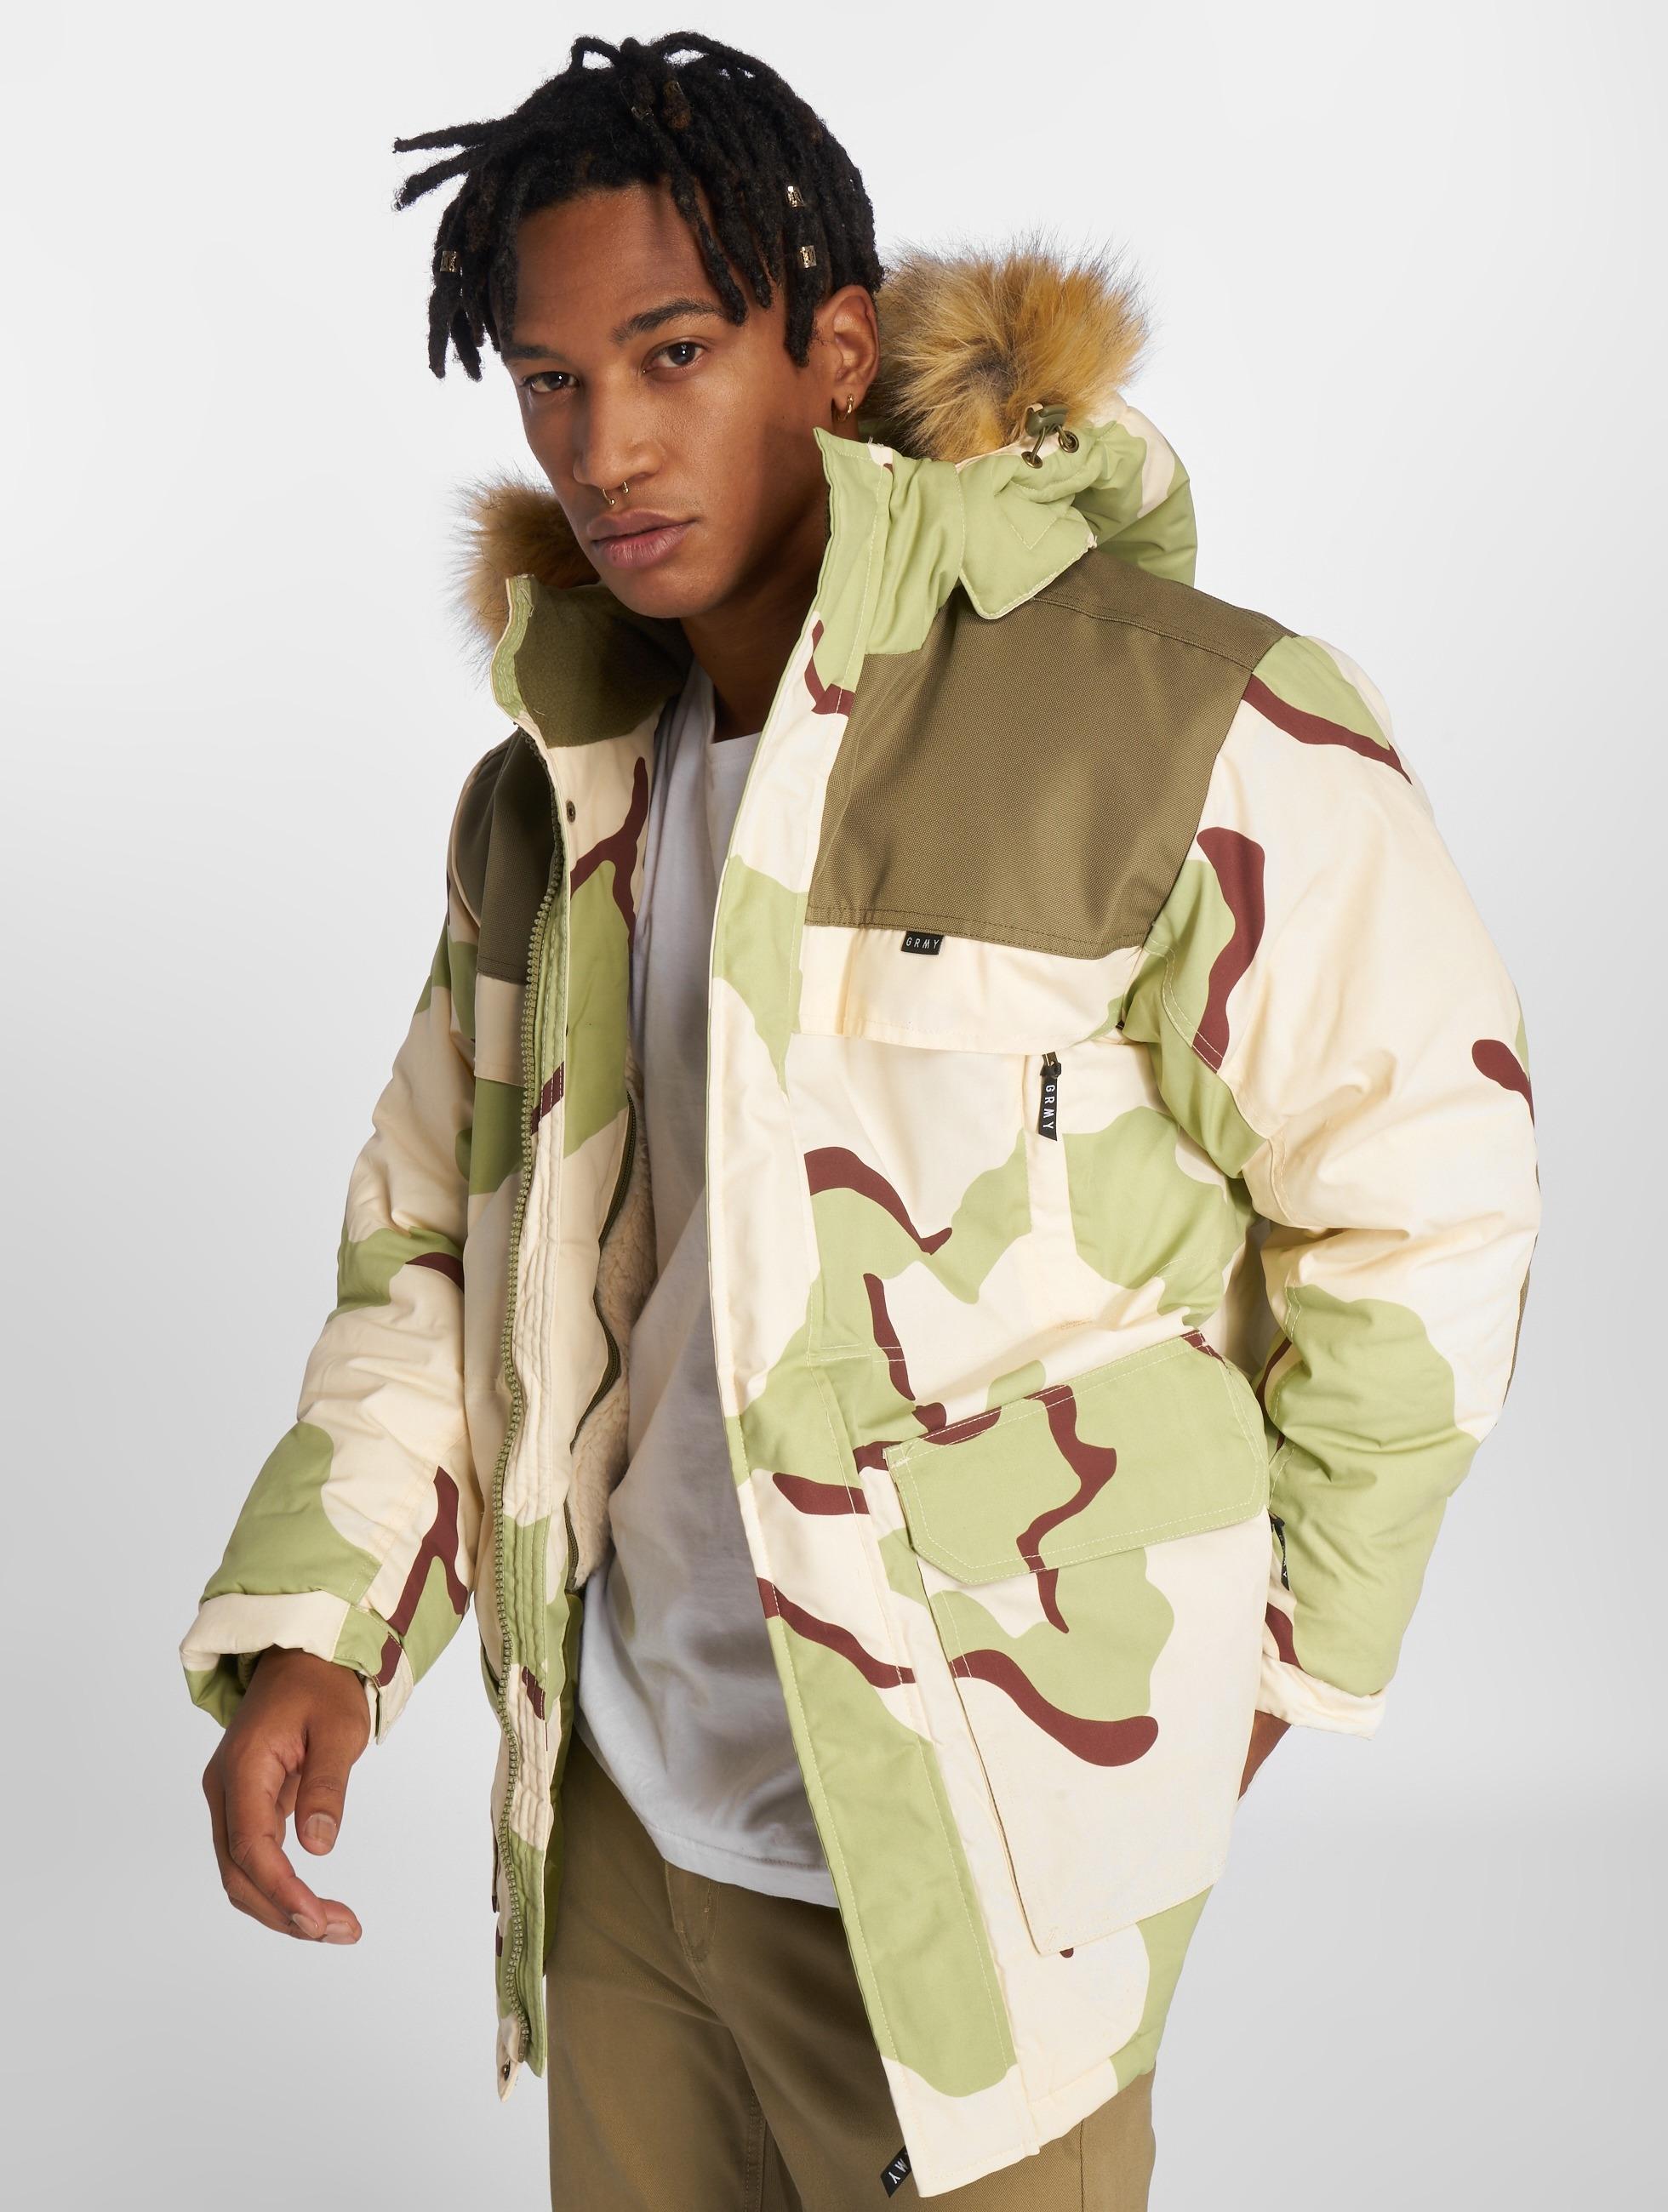 grimey wear pamir peaks camo camouflage homme manteau hiver 343414. Black Bedroom Furniture Sets. Home Design Ideas